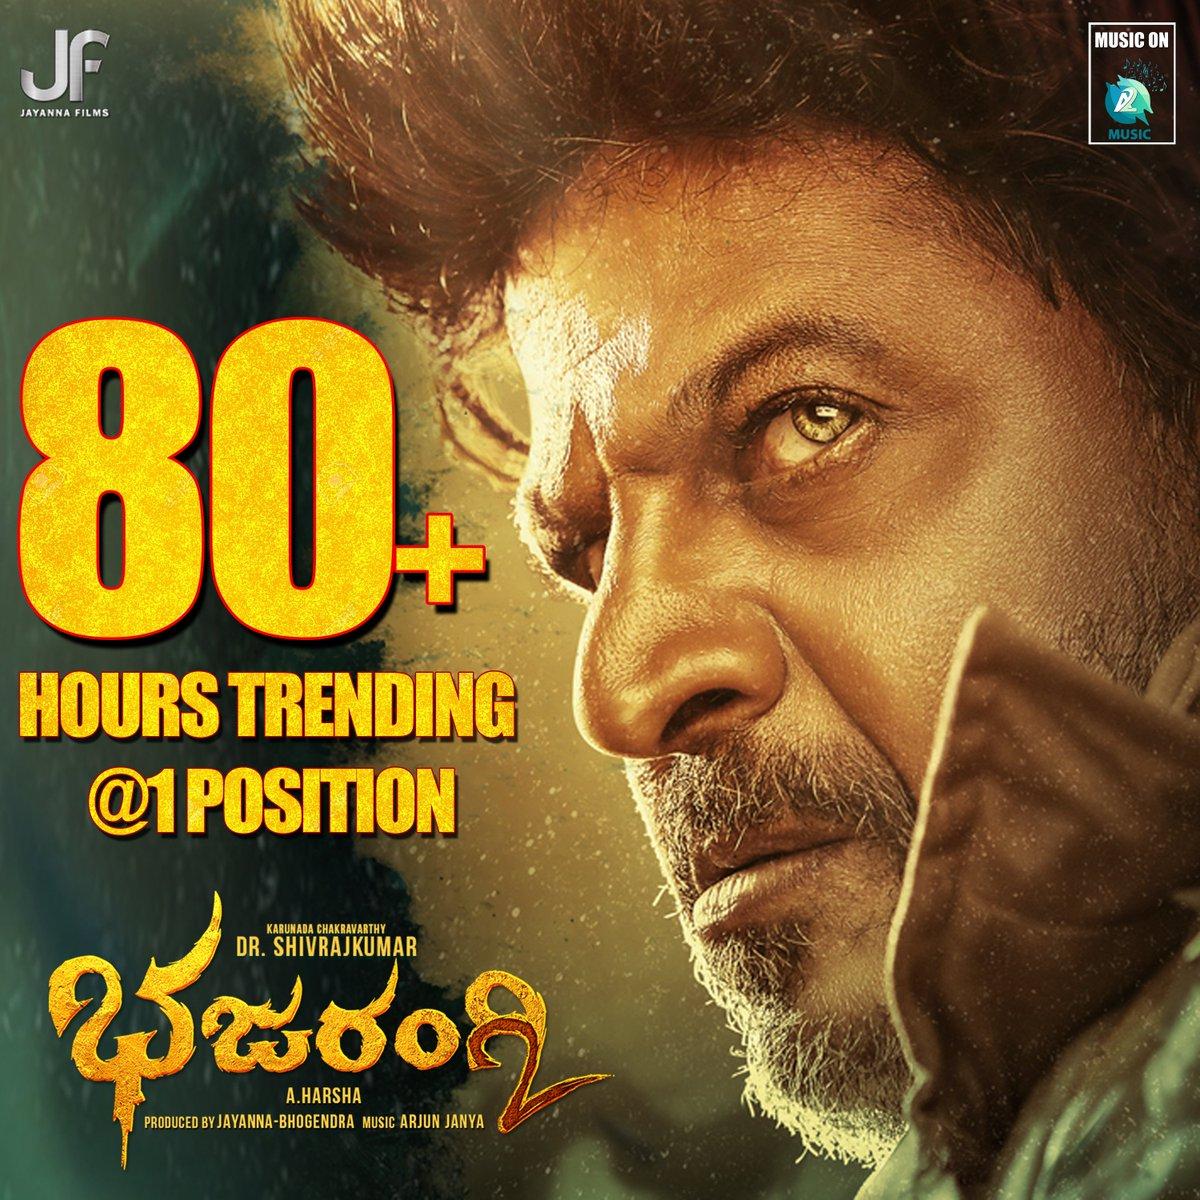 80+ Hours Trending #1Position,  Blockbuster Hit #Bhajarangi2 #Bhajarangi2Teaser #DrShivarajkumar #Bhavana #AHarsha #JayannaFilms #ArjunJanya   #Shivanna  #A2Music #ArjunJanyaMusical  #HBDShivanna #NimmaShivanna #NimmaAHarsha #letzkit Link :